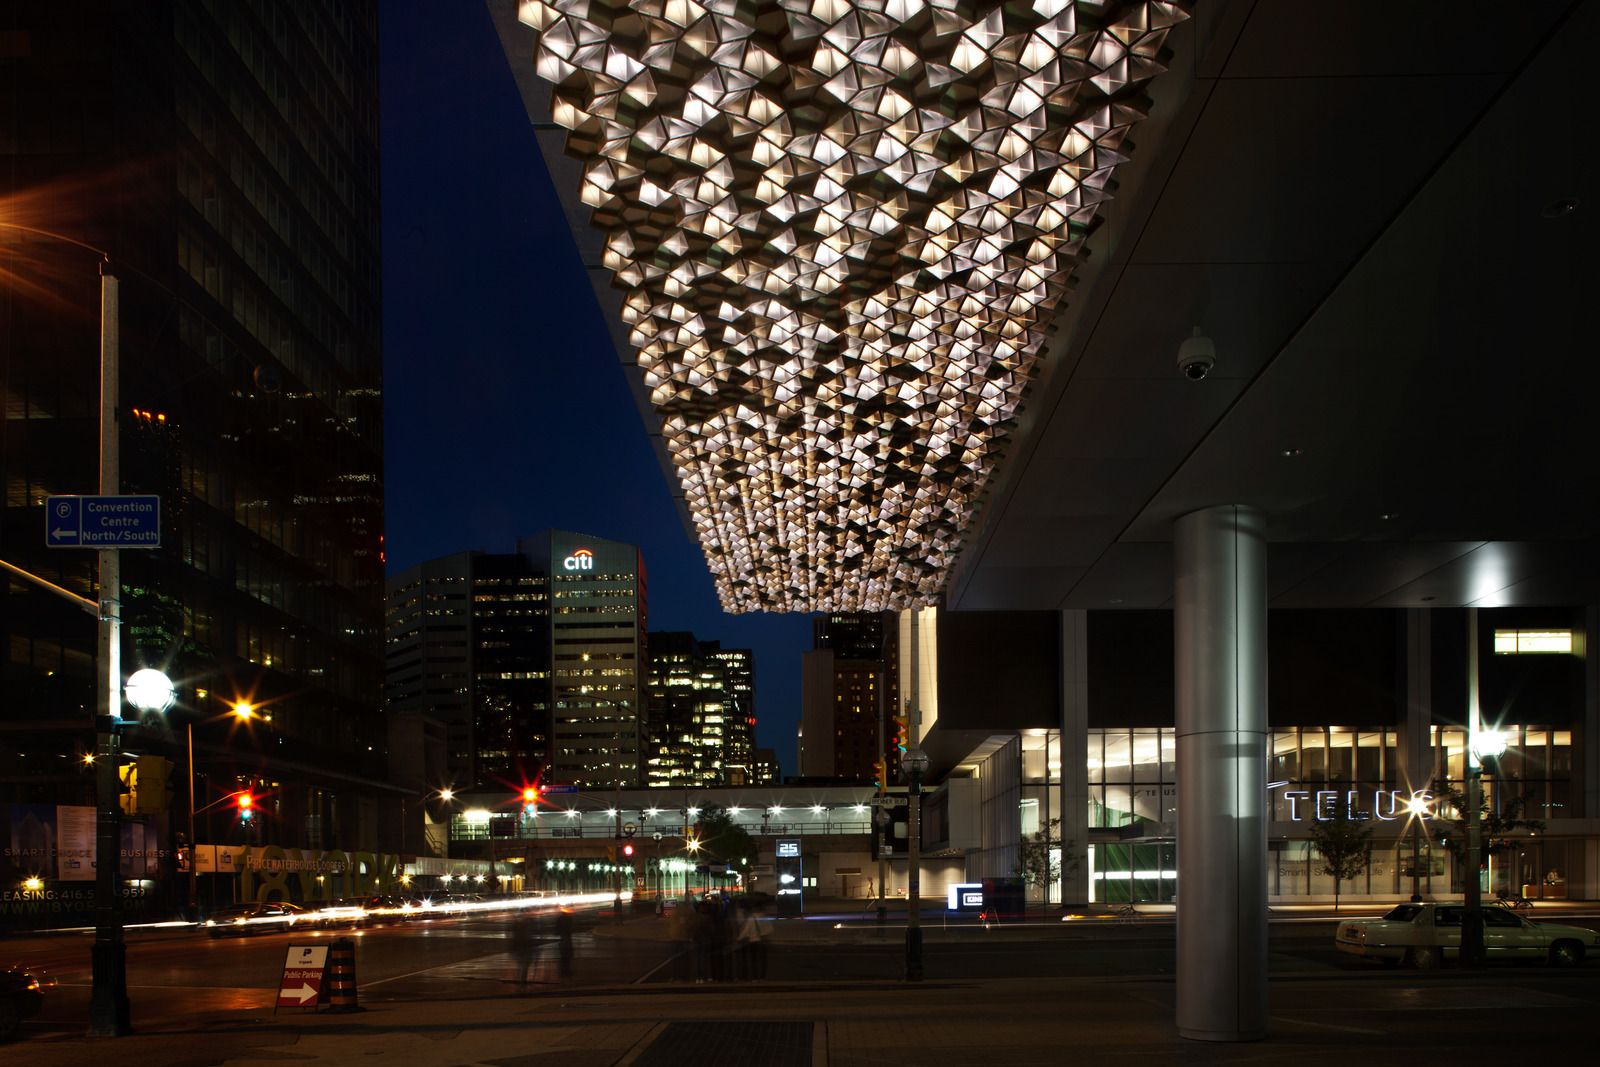 & ETFE - Vordach SKF - Ceno Textile Architektur | Le Forme | Pinterest